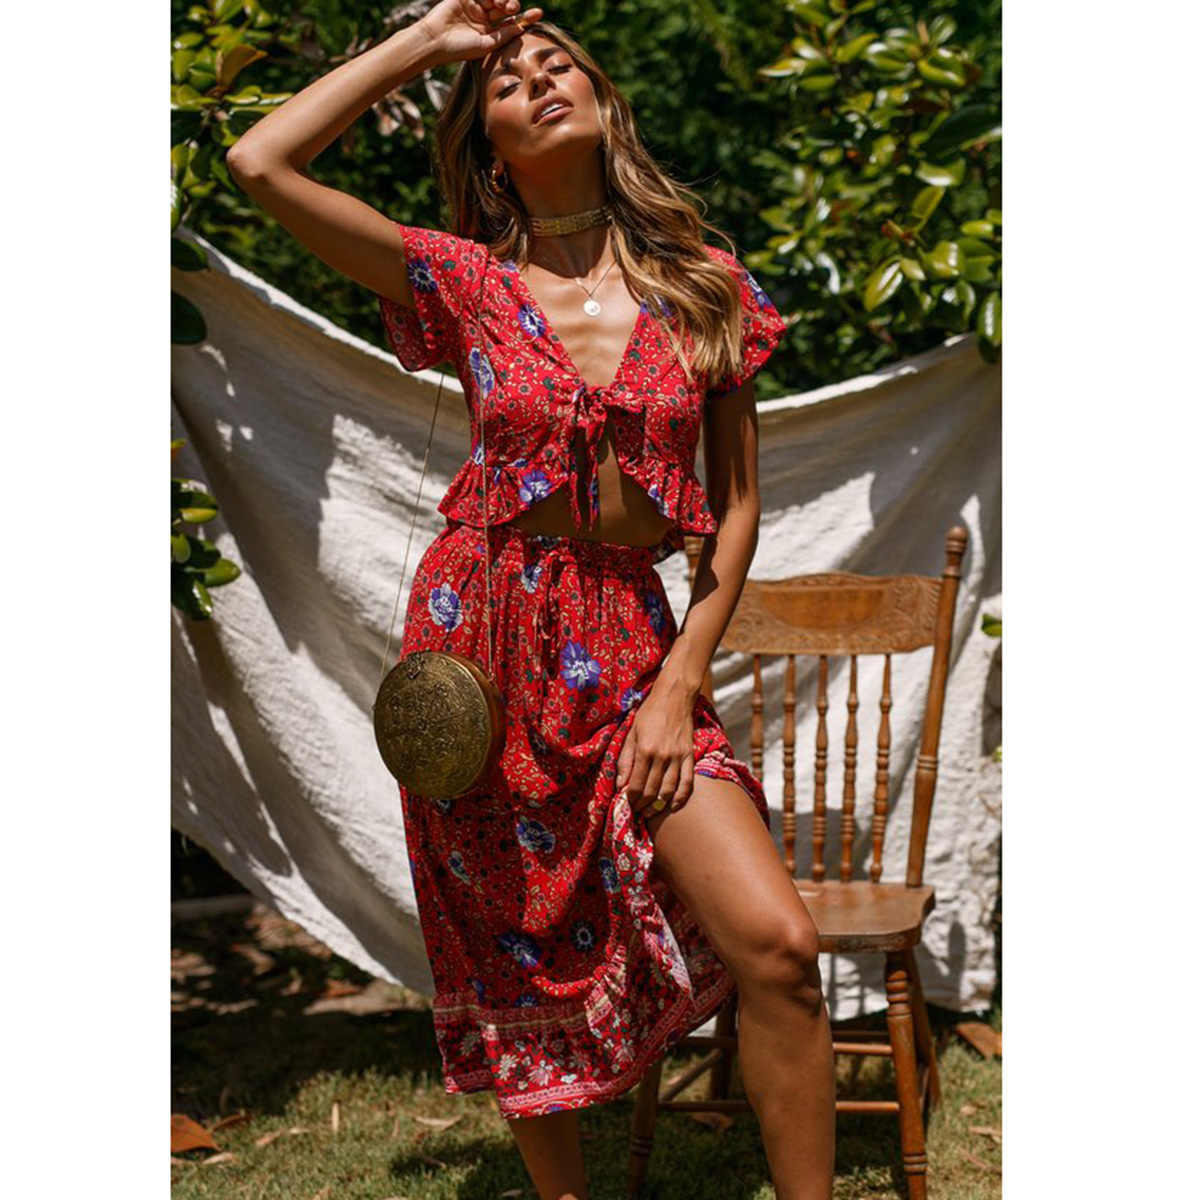 e5539d6a48226 Detail Feedback Questions about Ruffles Floral Print Boho Maxi Skirt ...